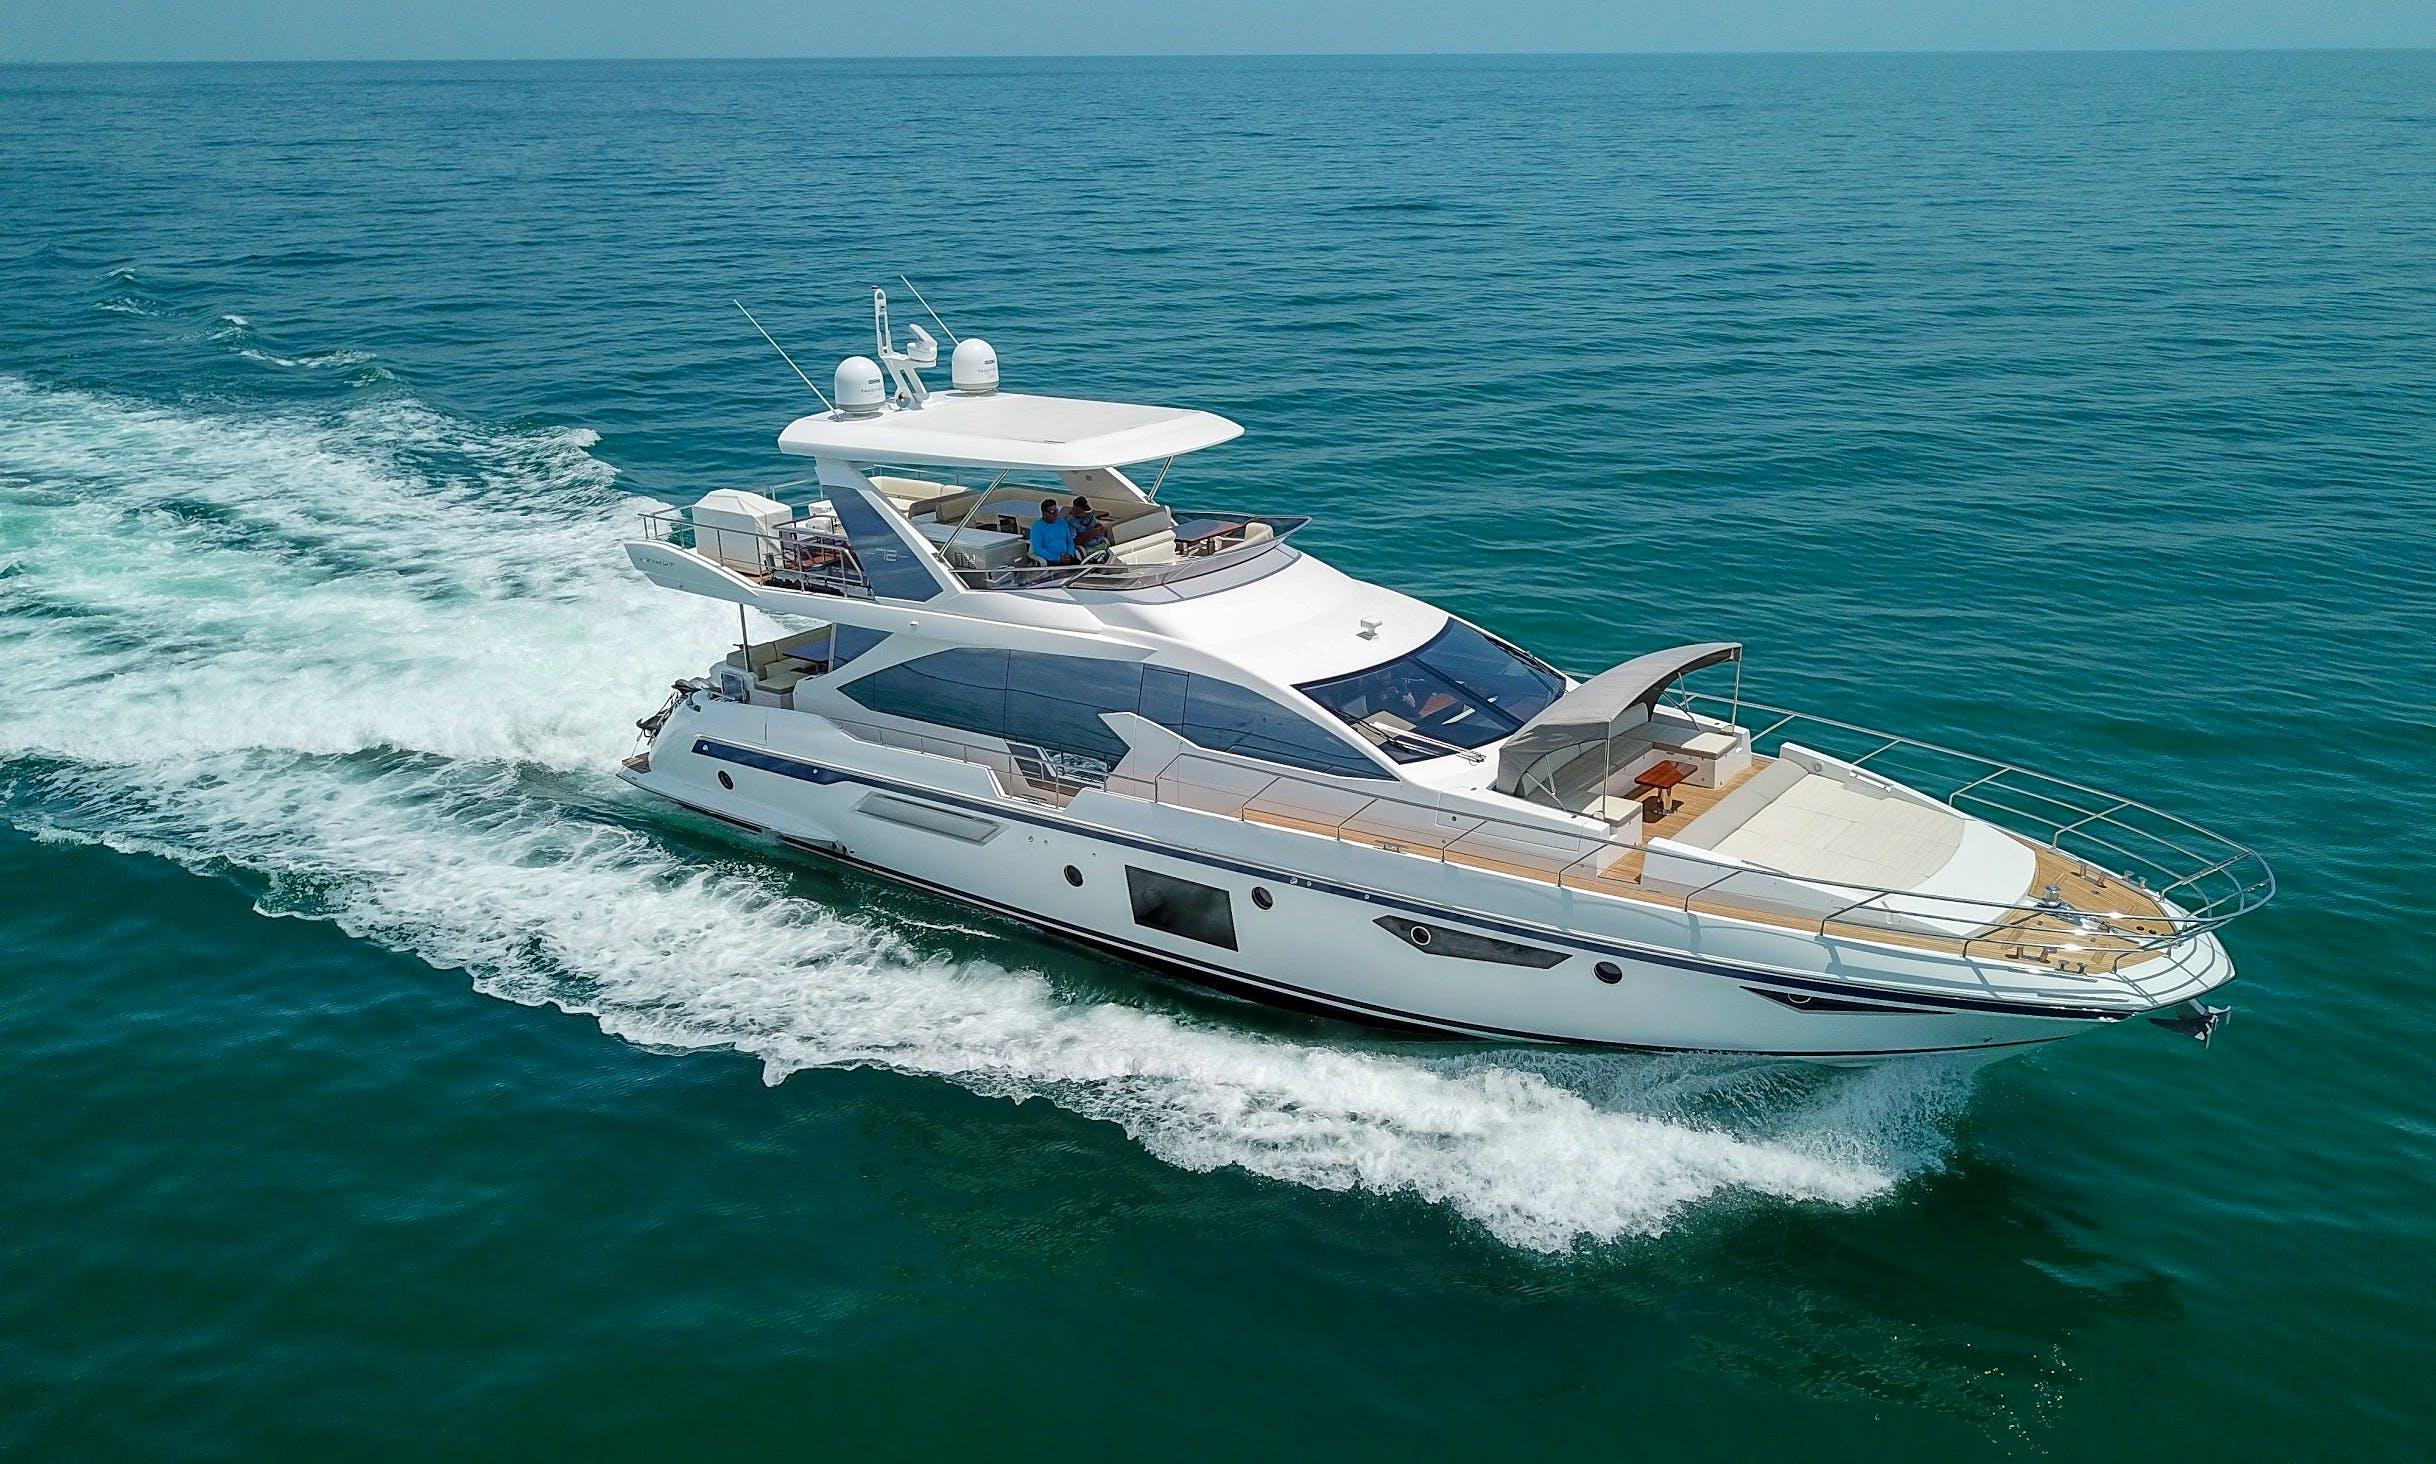 Luxury Style 72' Azimut Yacht